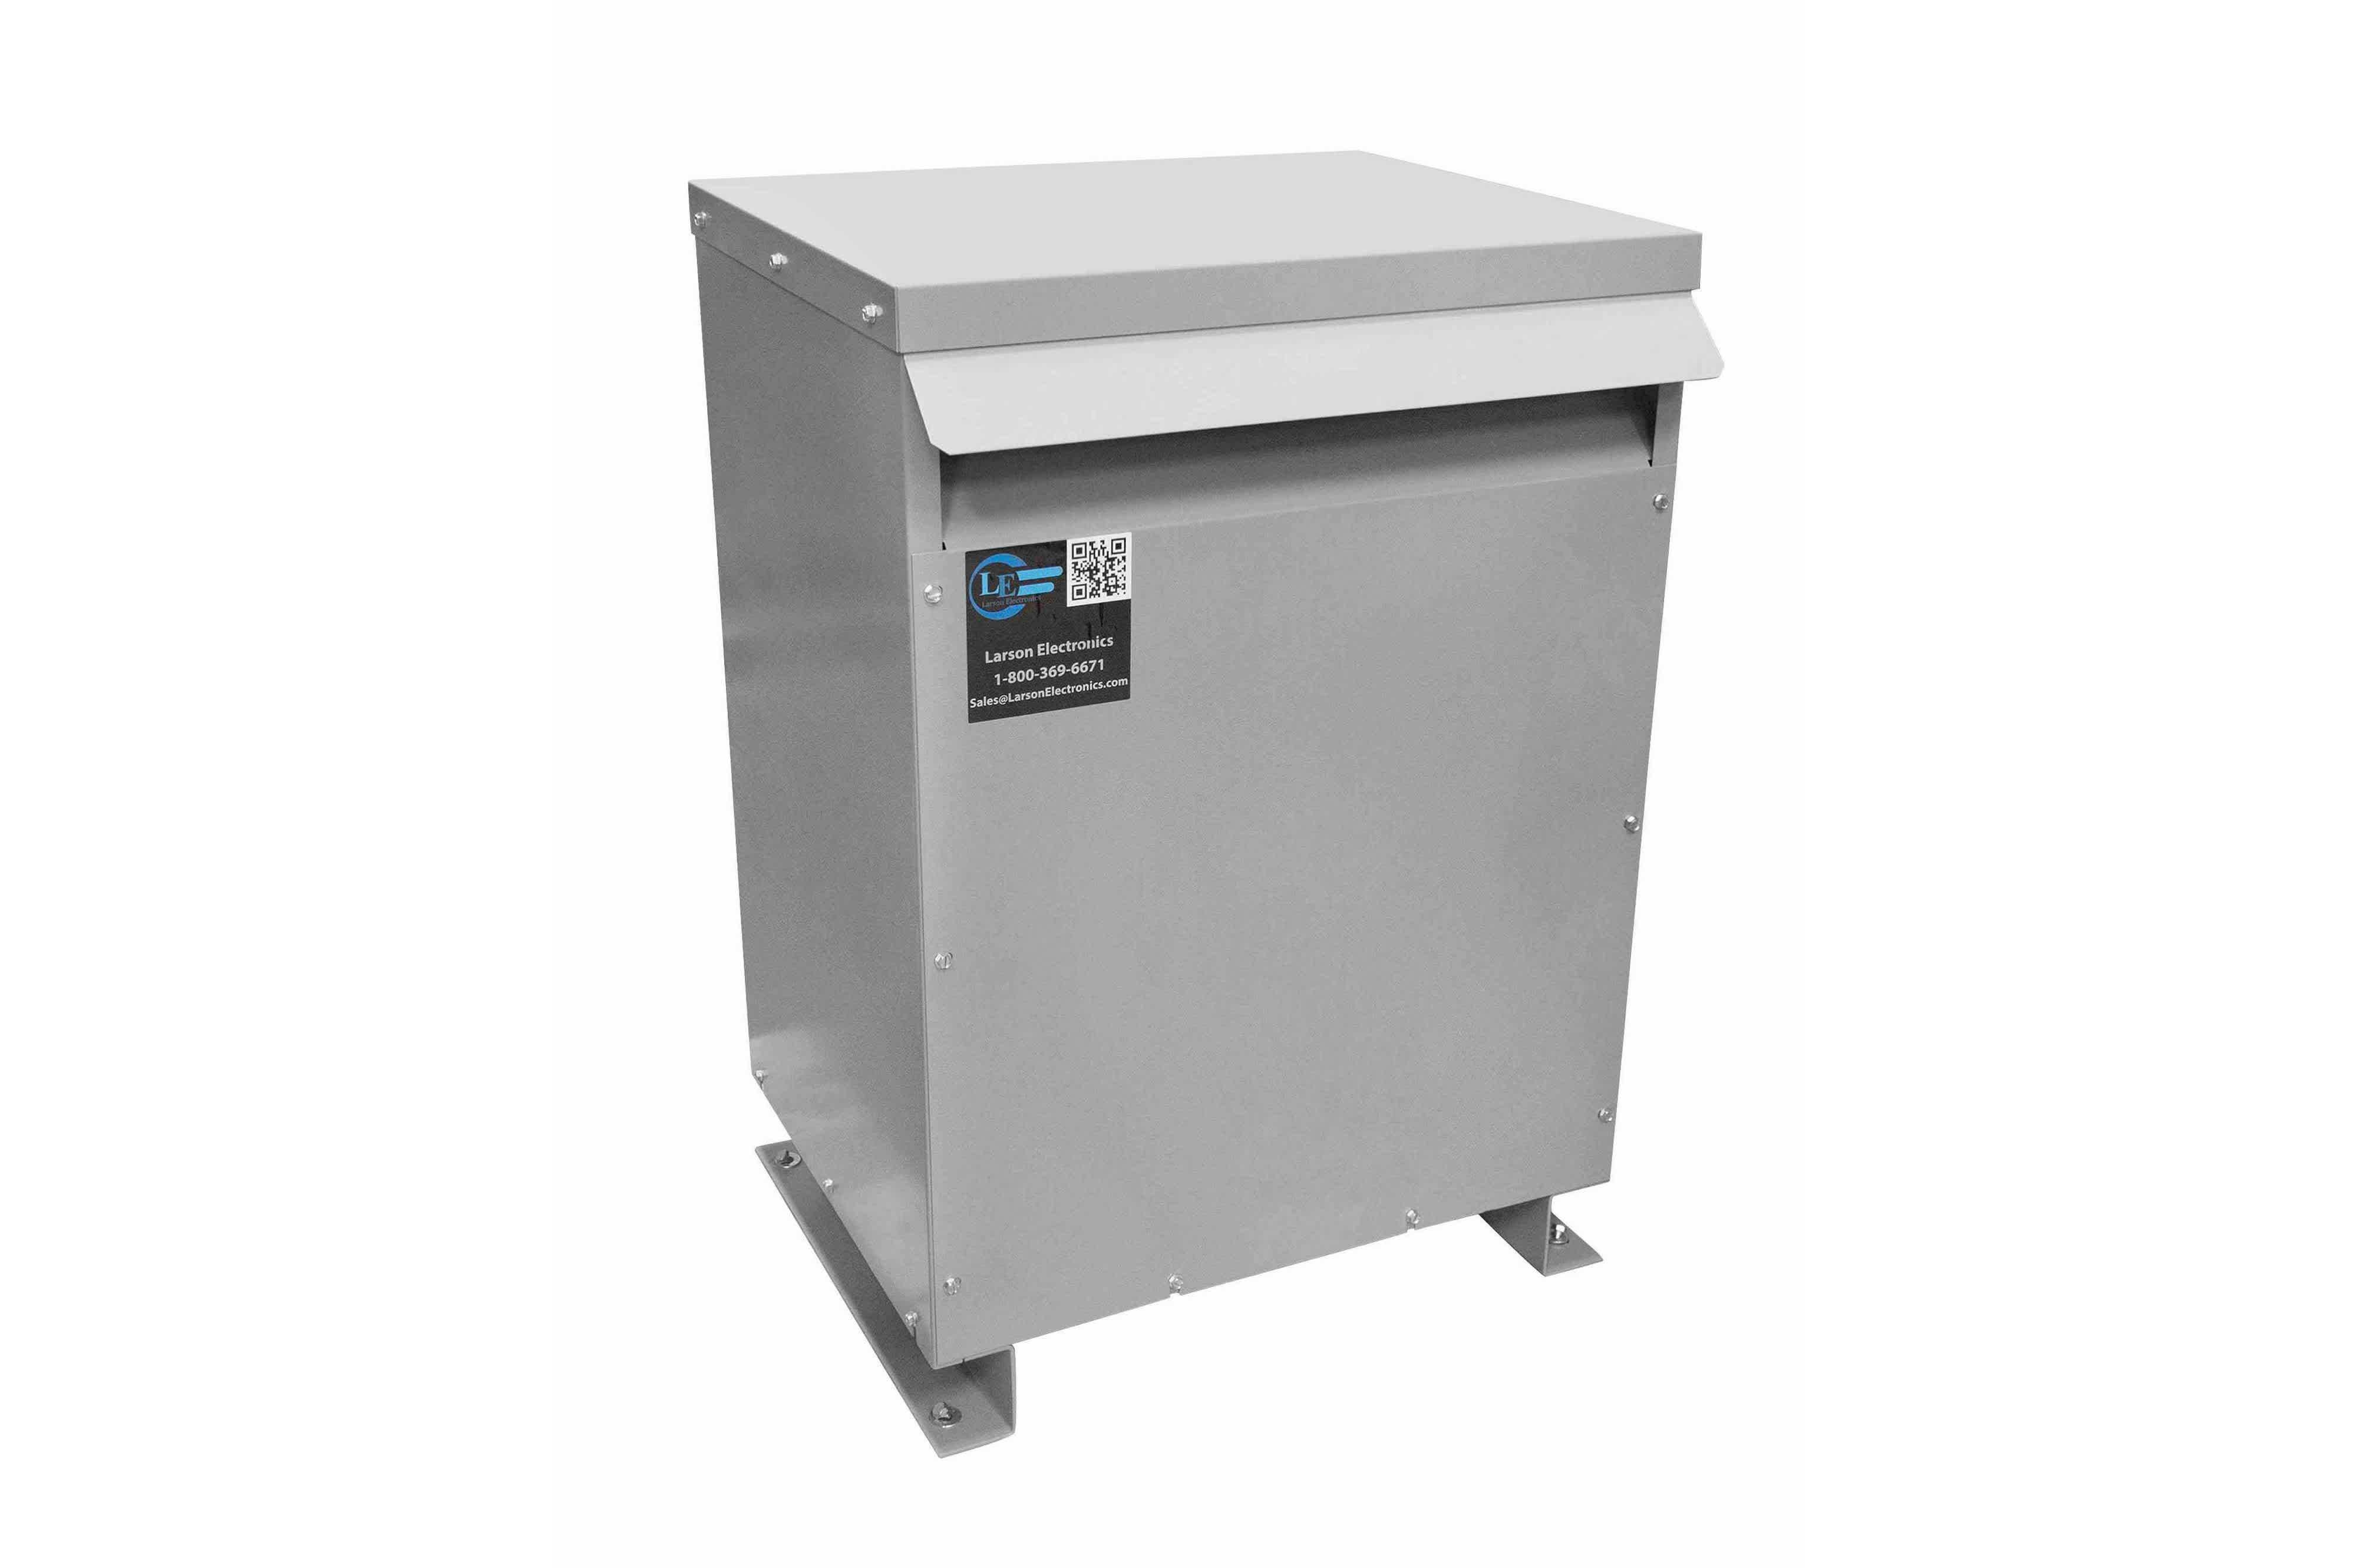 32.5 kVA 3PH Isolation Transformer, 240V Wye Primary, 400Y/231 Wye-N Secondary, N3R, Ventilated, 60 Hz